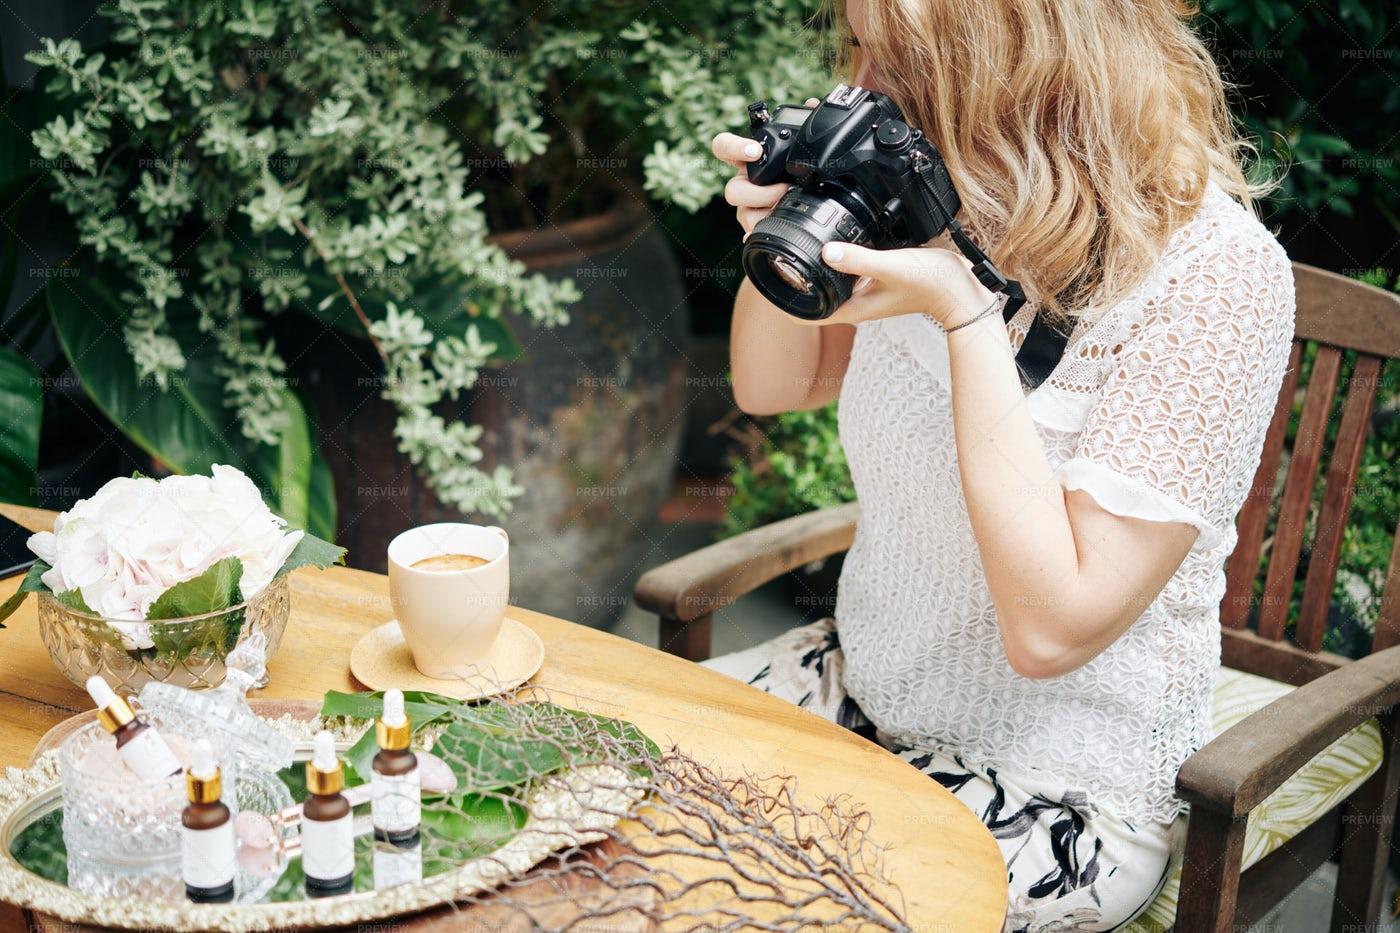 Woman Photographing Organic Cosmetics: Stock Photos